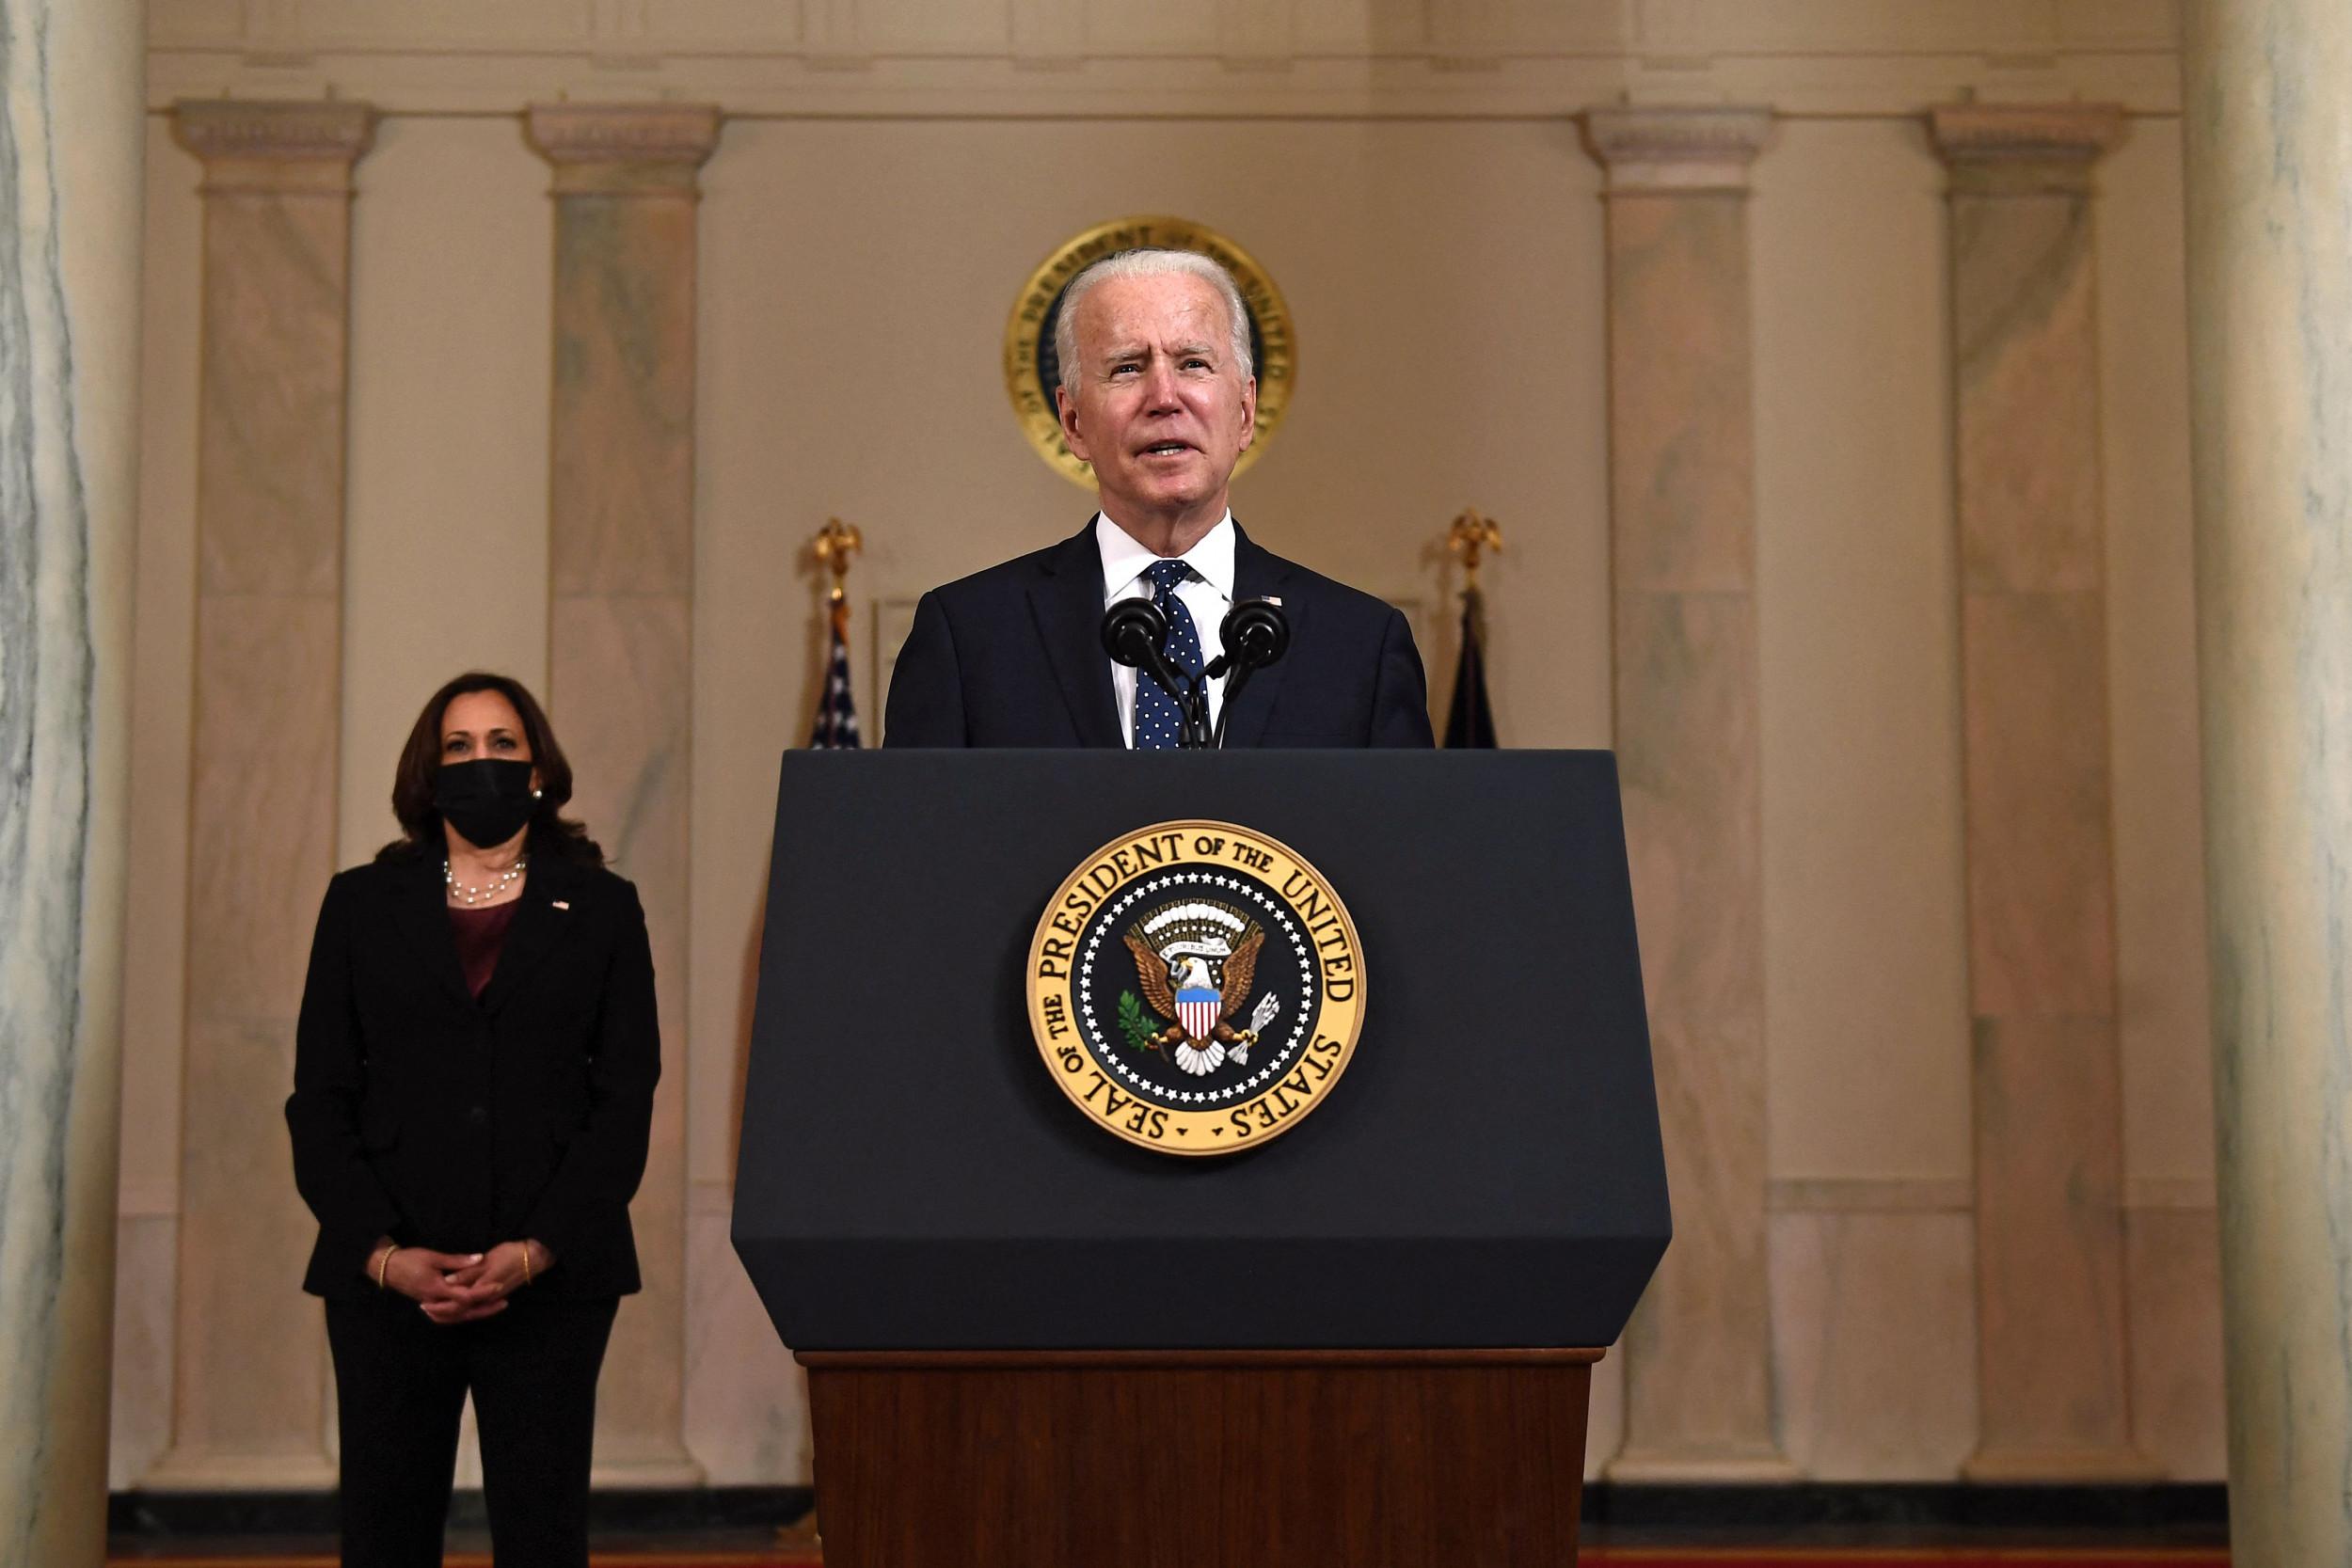 Joe Biden Says Derek Chauvin Verdict Can Prompt 'Moment of Significant Change' for U.S.